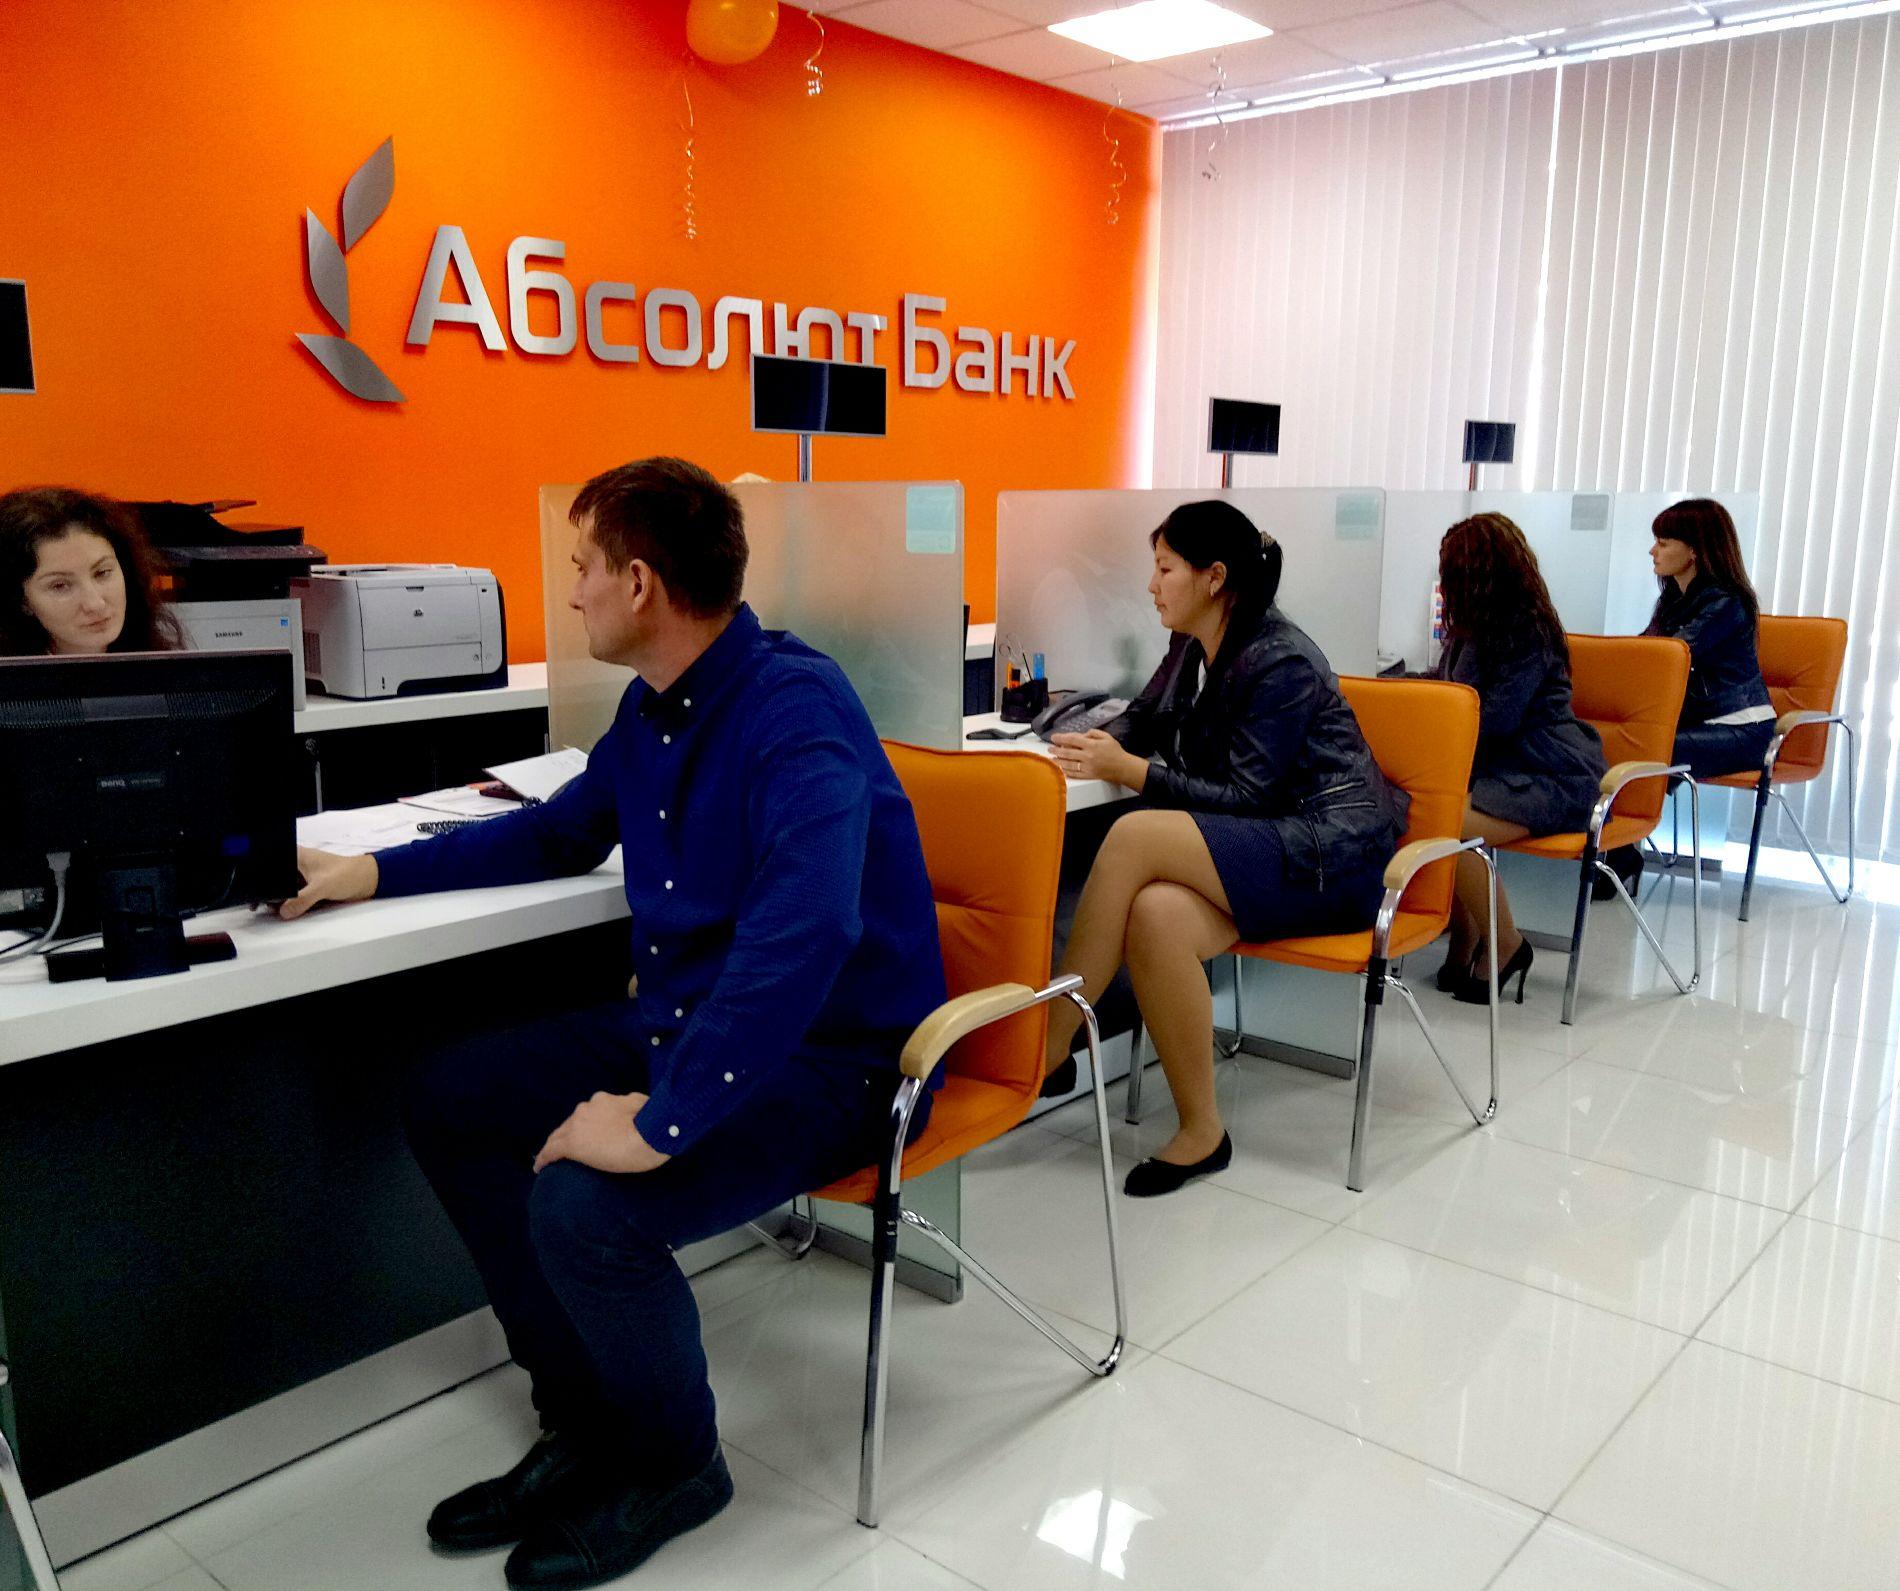 задача анапа вакансии в банках ногтей Новосибирске